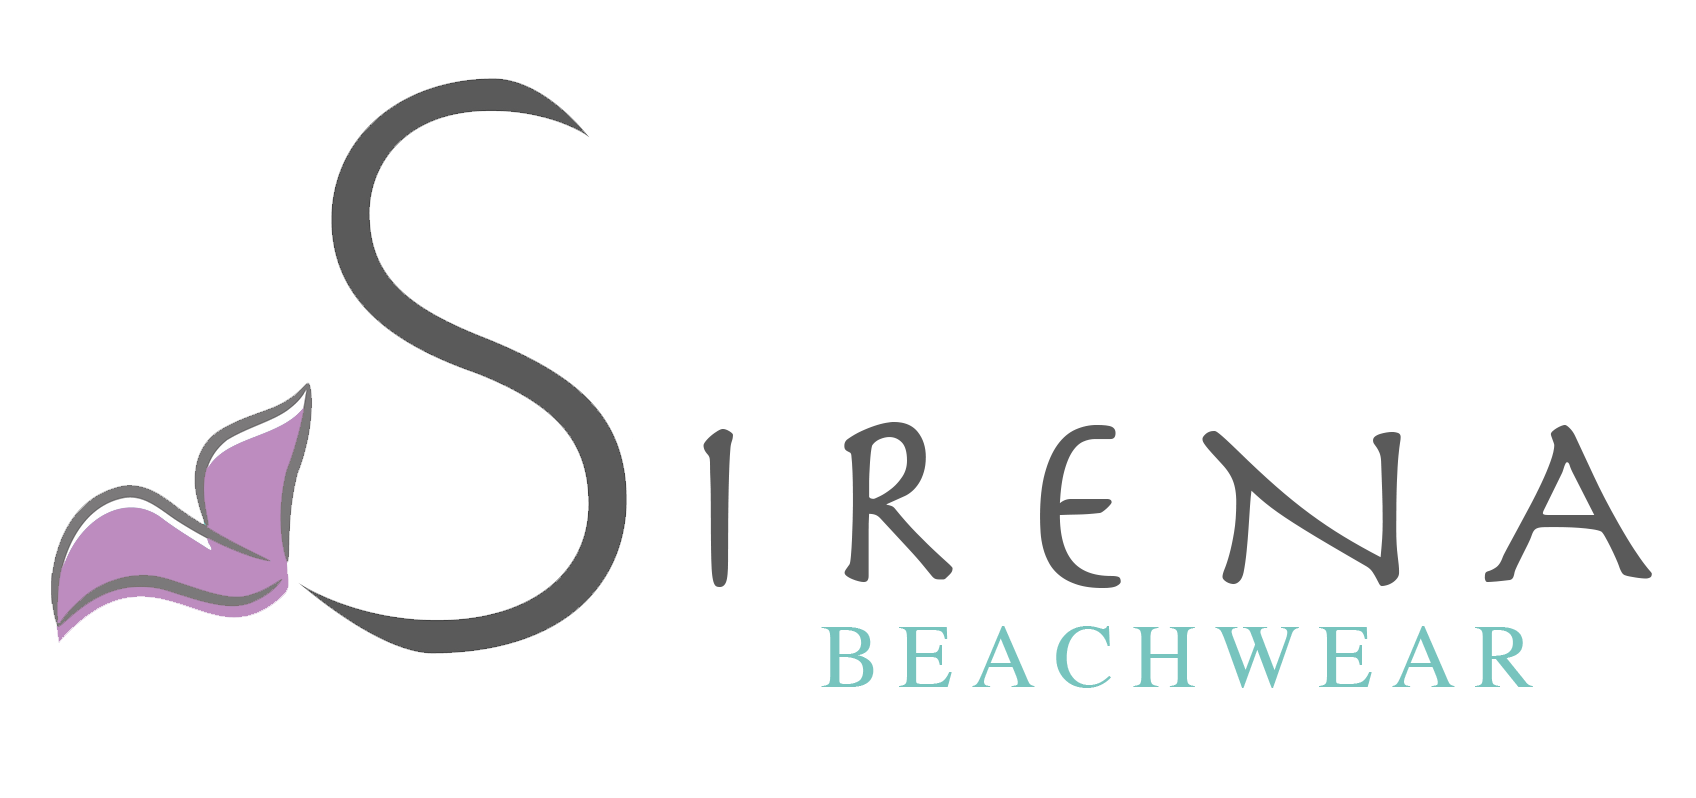 Swimsuit clipart beach wear. Sirena beachwear trendy retailer